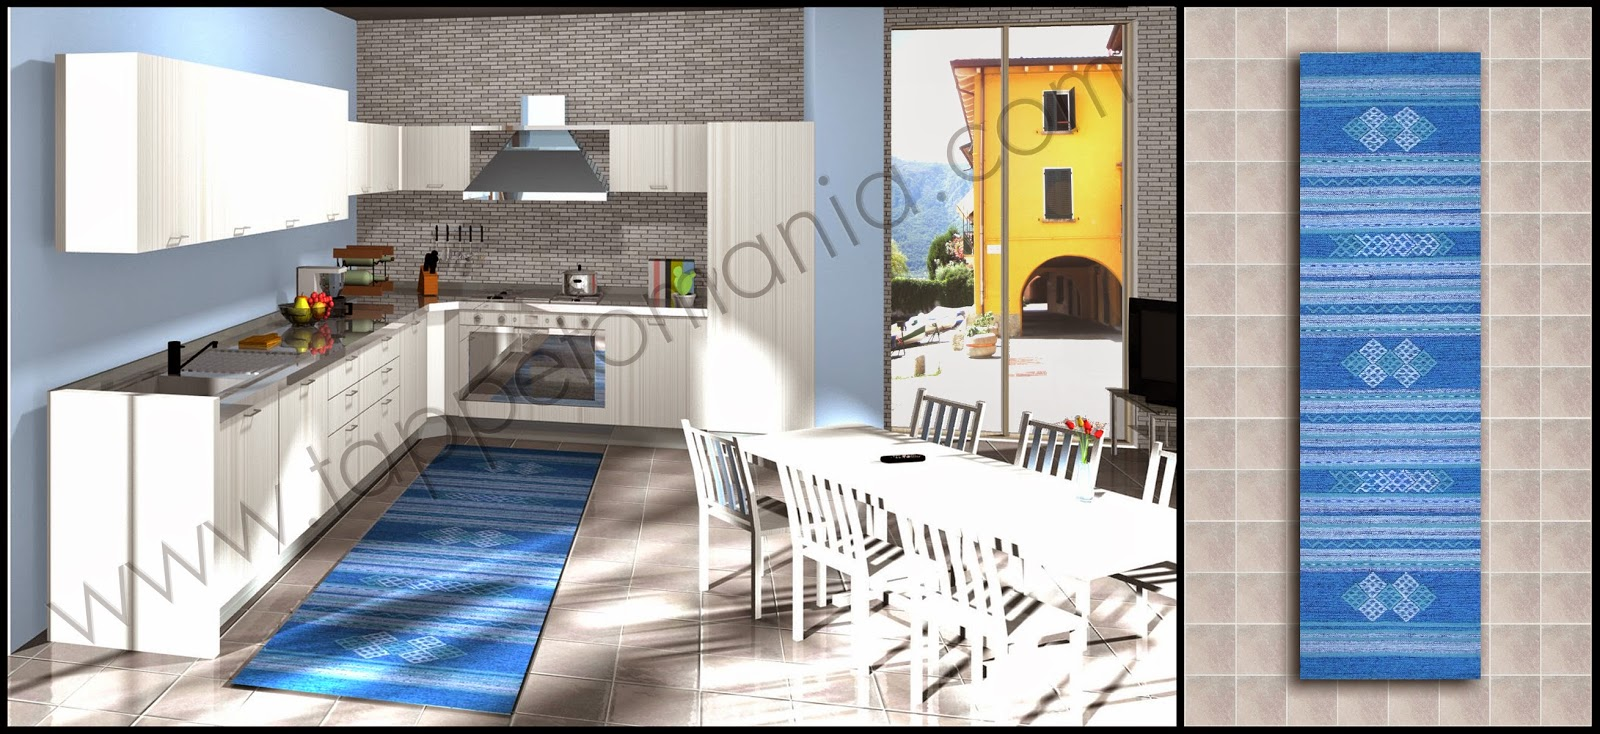 Tappeti antiscivolo online tappeti tappeti cucina stuoie for Passatoie per cucina